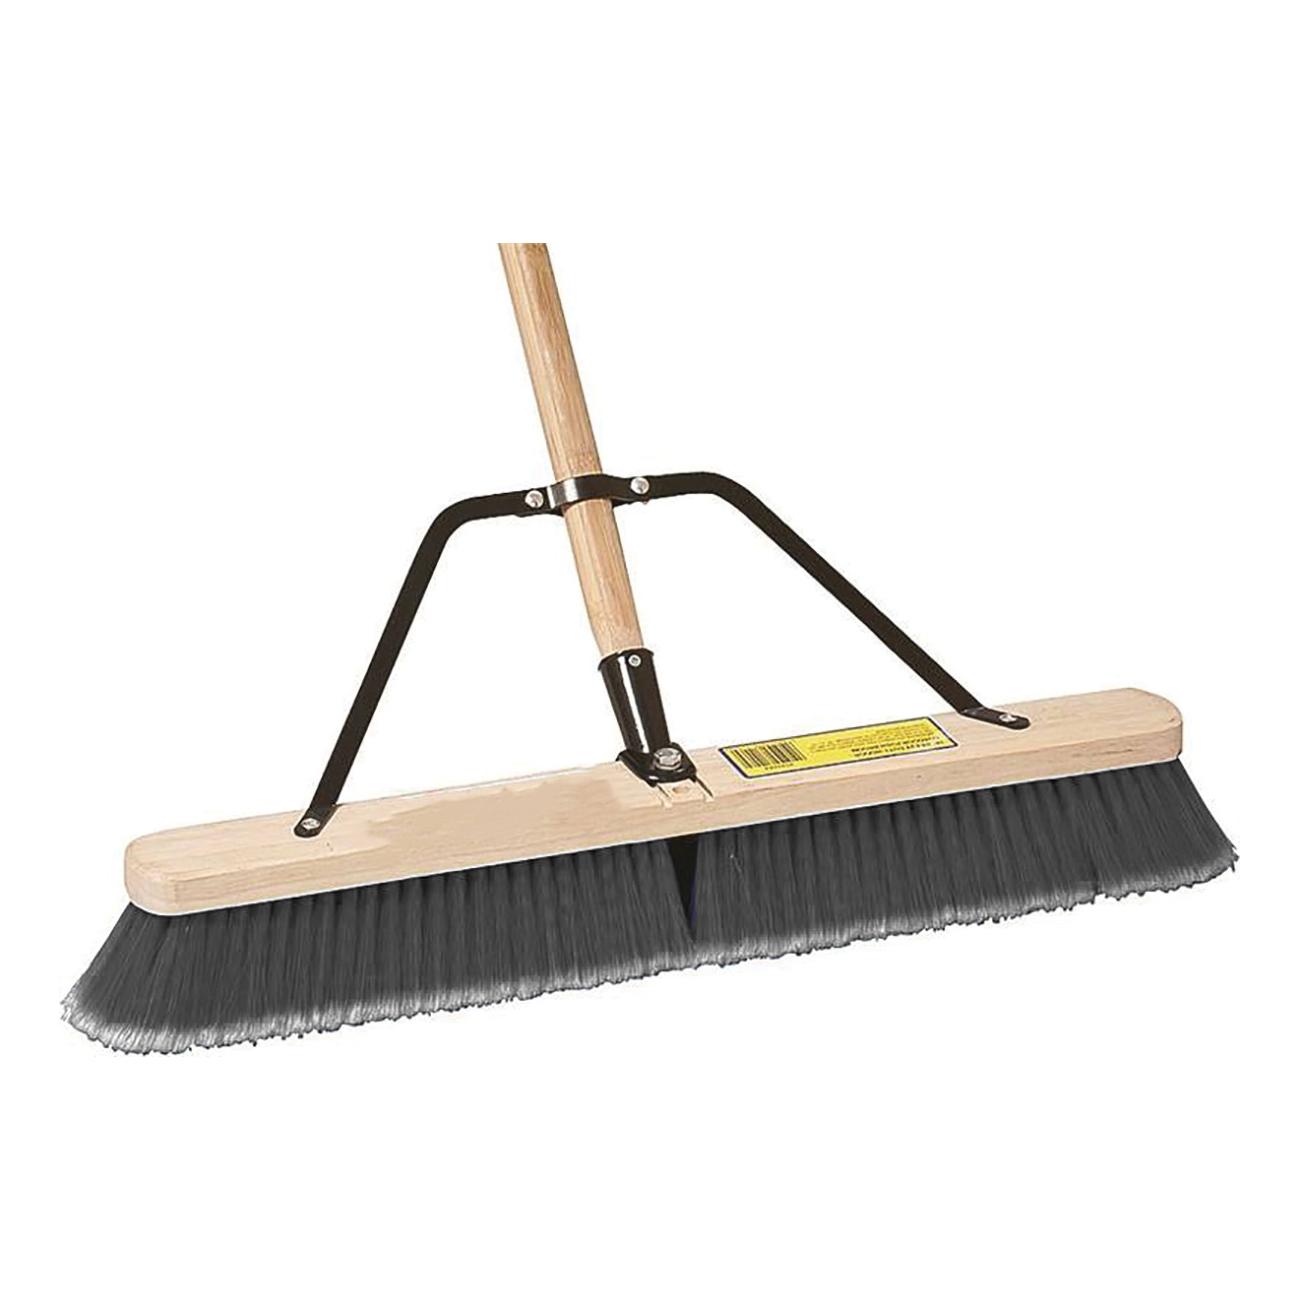 Picture of Simple Spaces 93140 Push Broom, 3 in L Trim, Polypropylene Bristle, Hardwood Handle